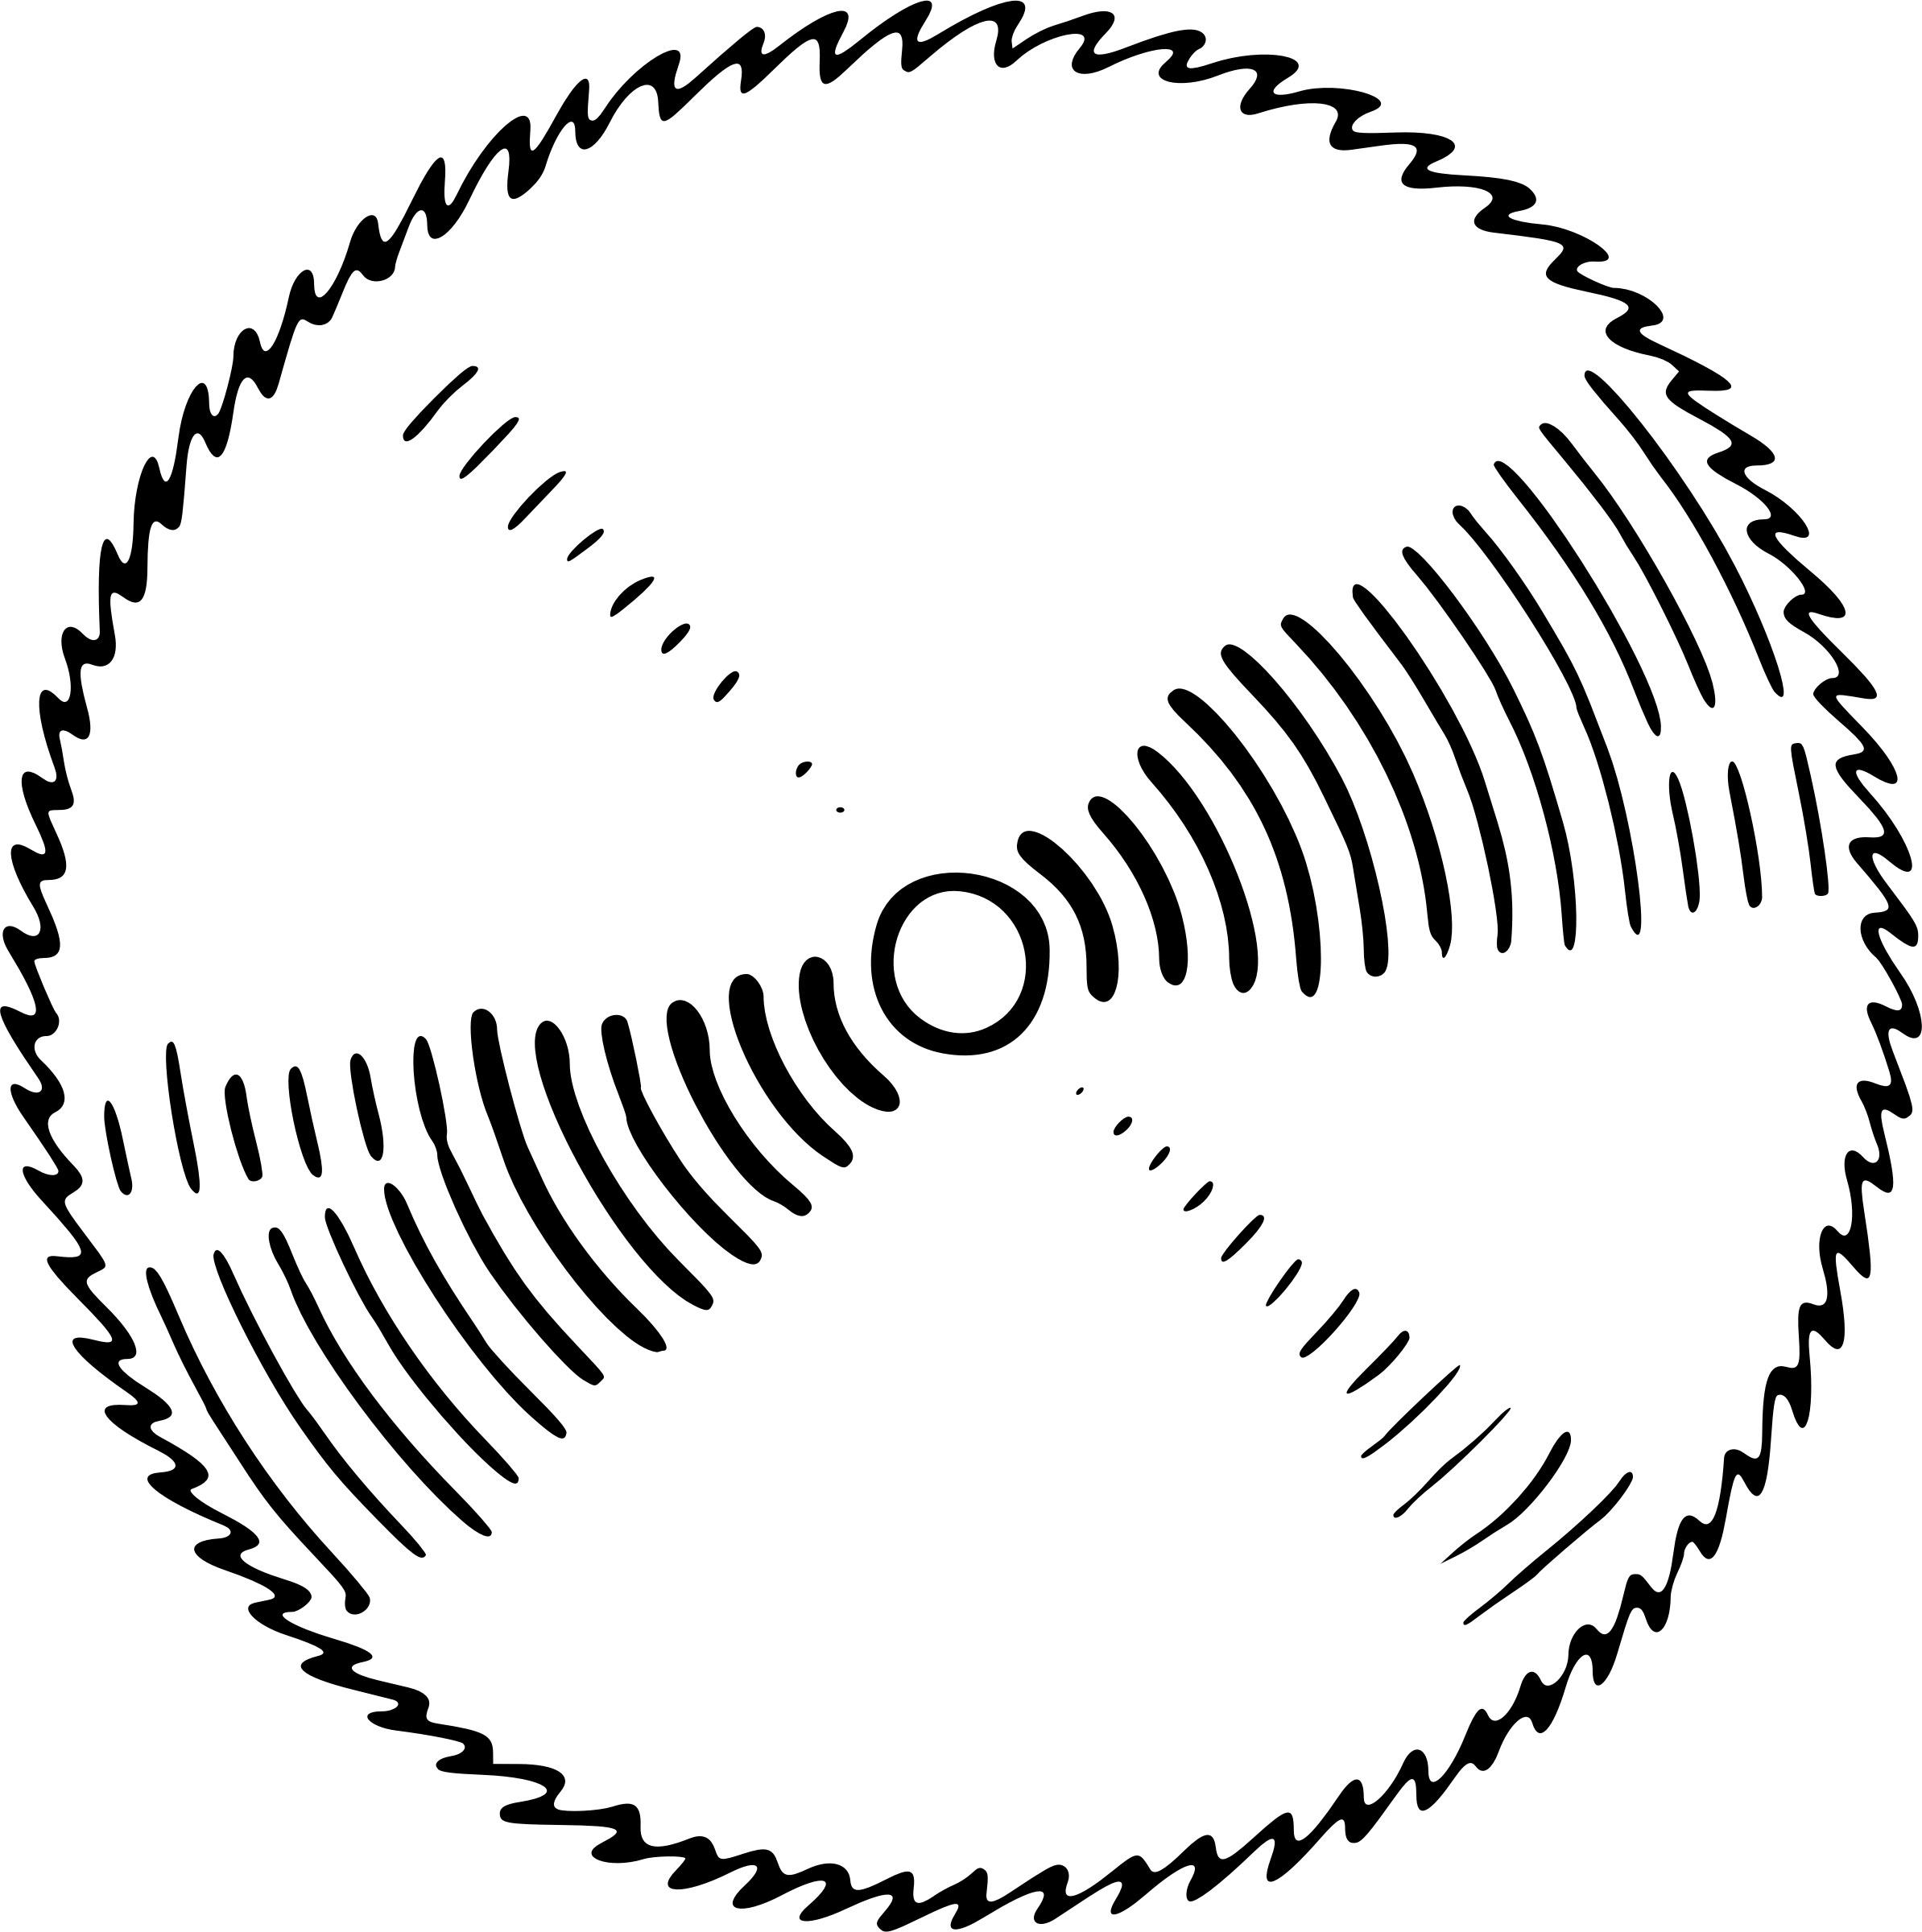 Circular Saw Graphic Vector Clipart Image